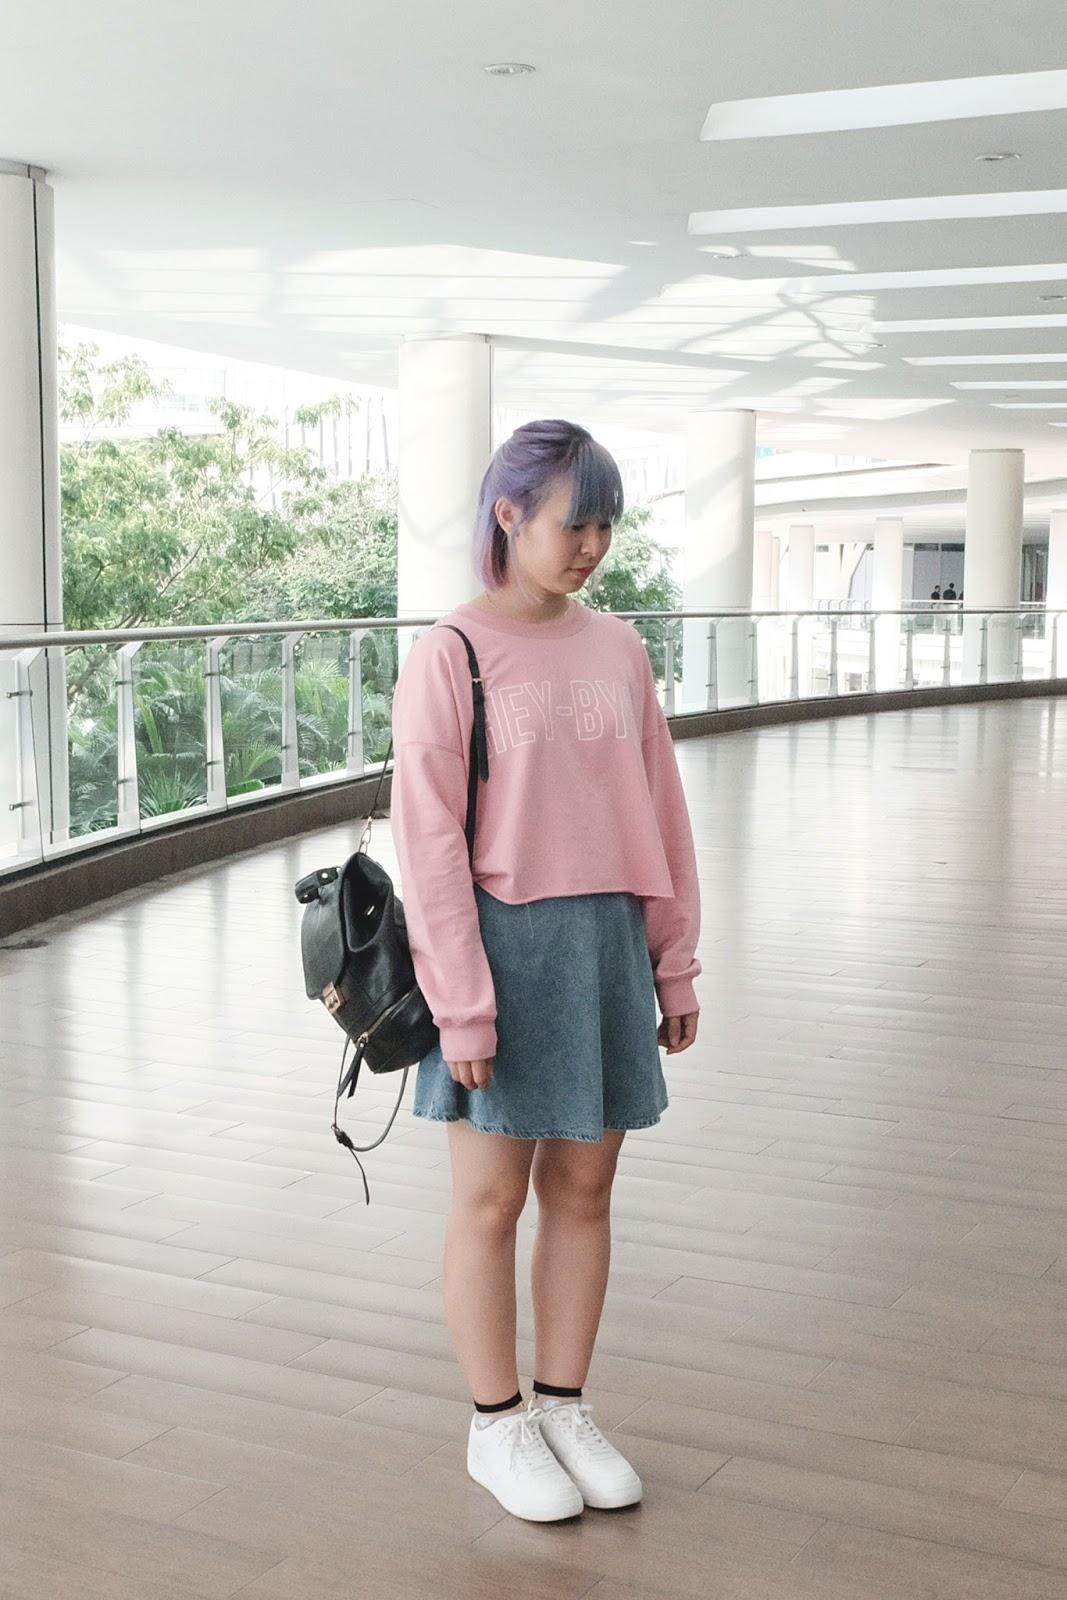 Hey Bye Pastel Outfit | www.bigdreamerblog.com